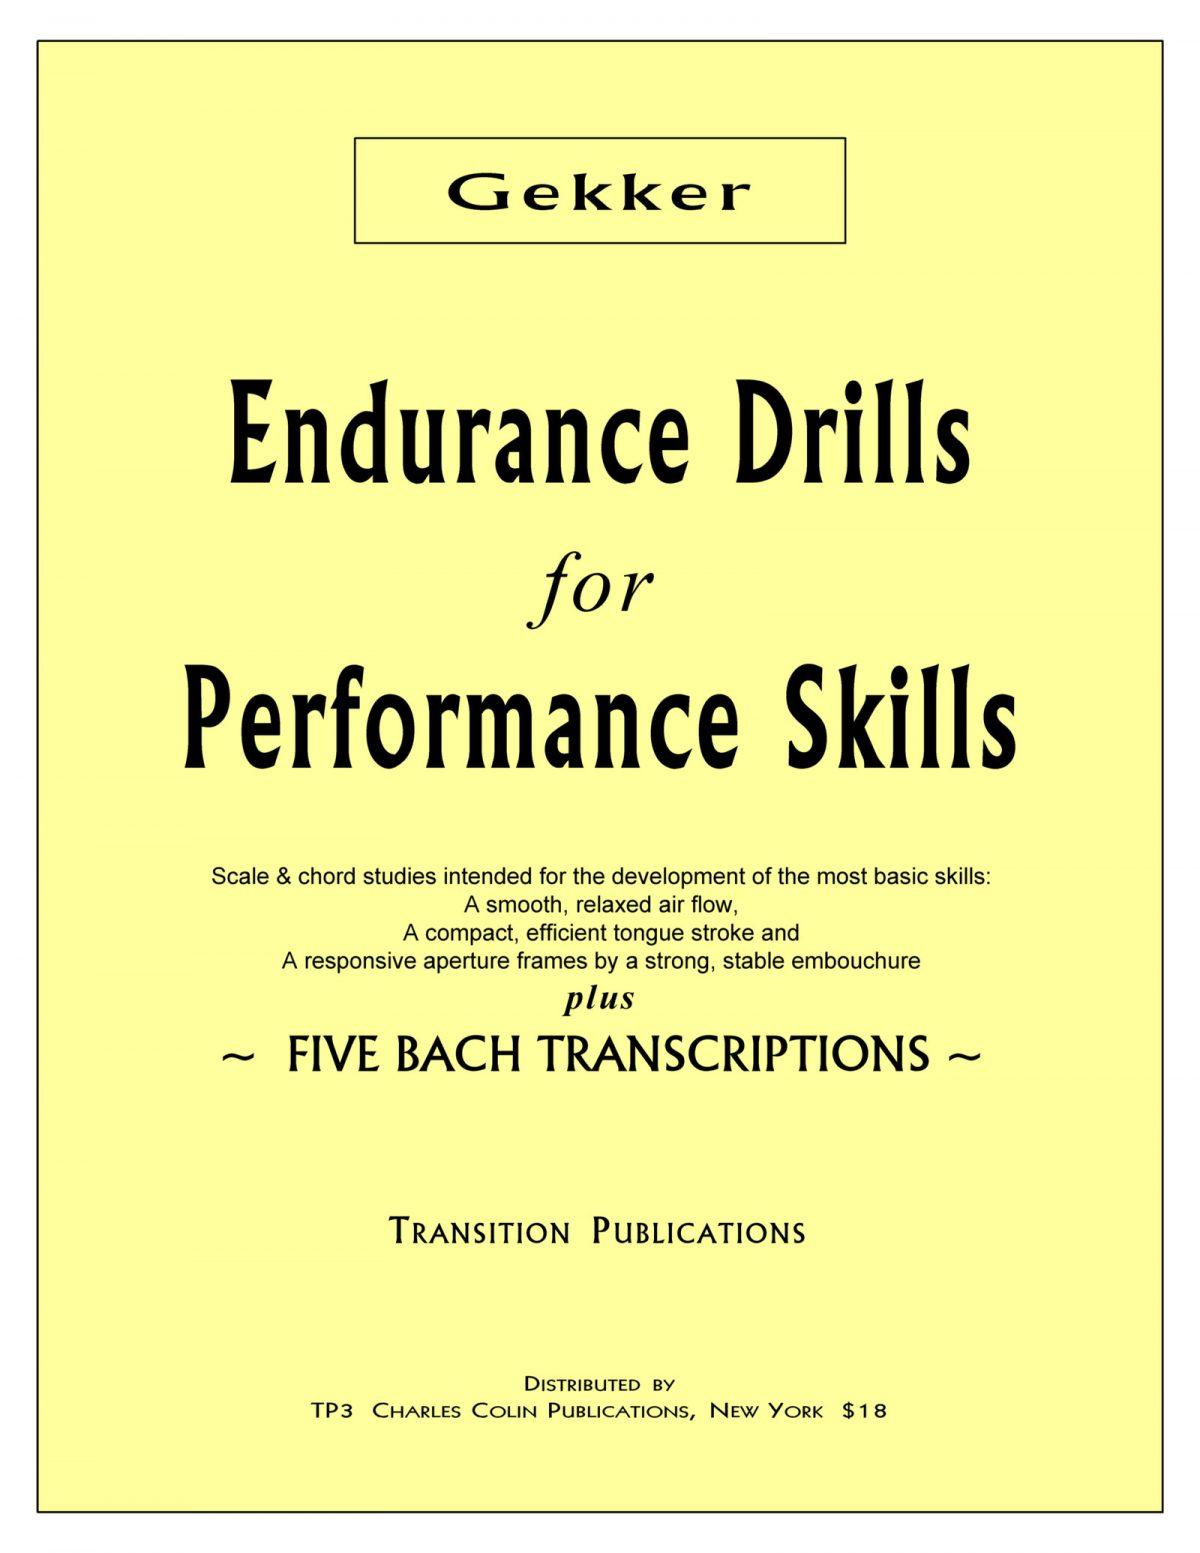 Gekker, Enducance Drills for Performance Skills PDF